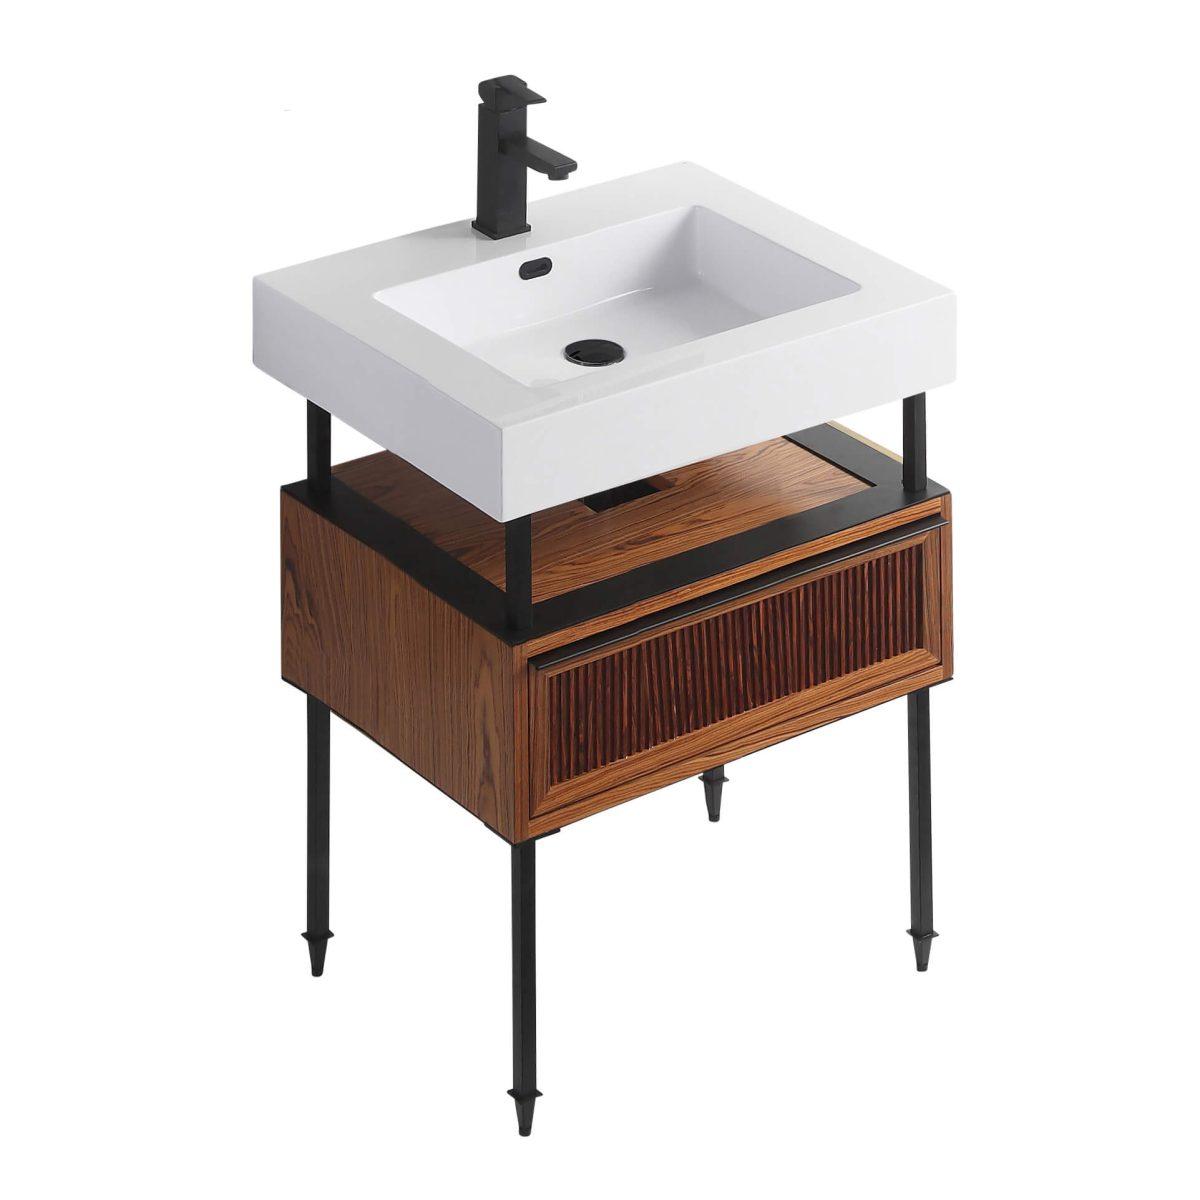 "Dakota 24"" Modern Bathroom Vanity  Teak Brown with Black Hardware"